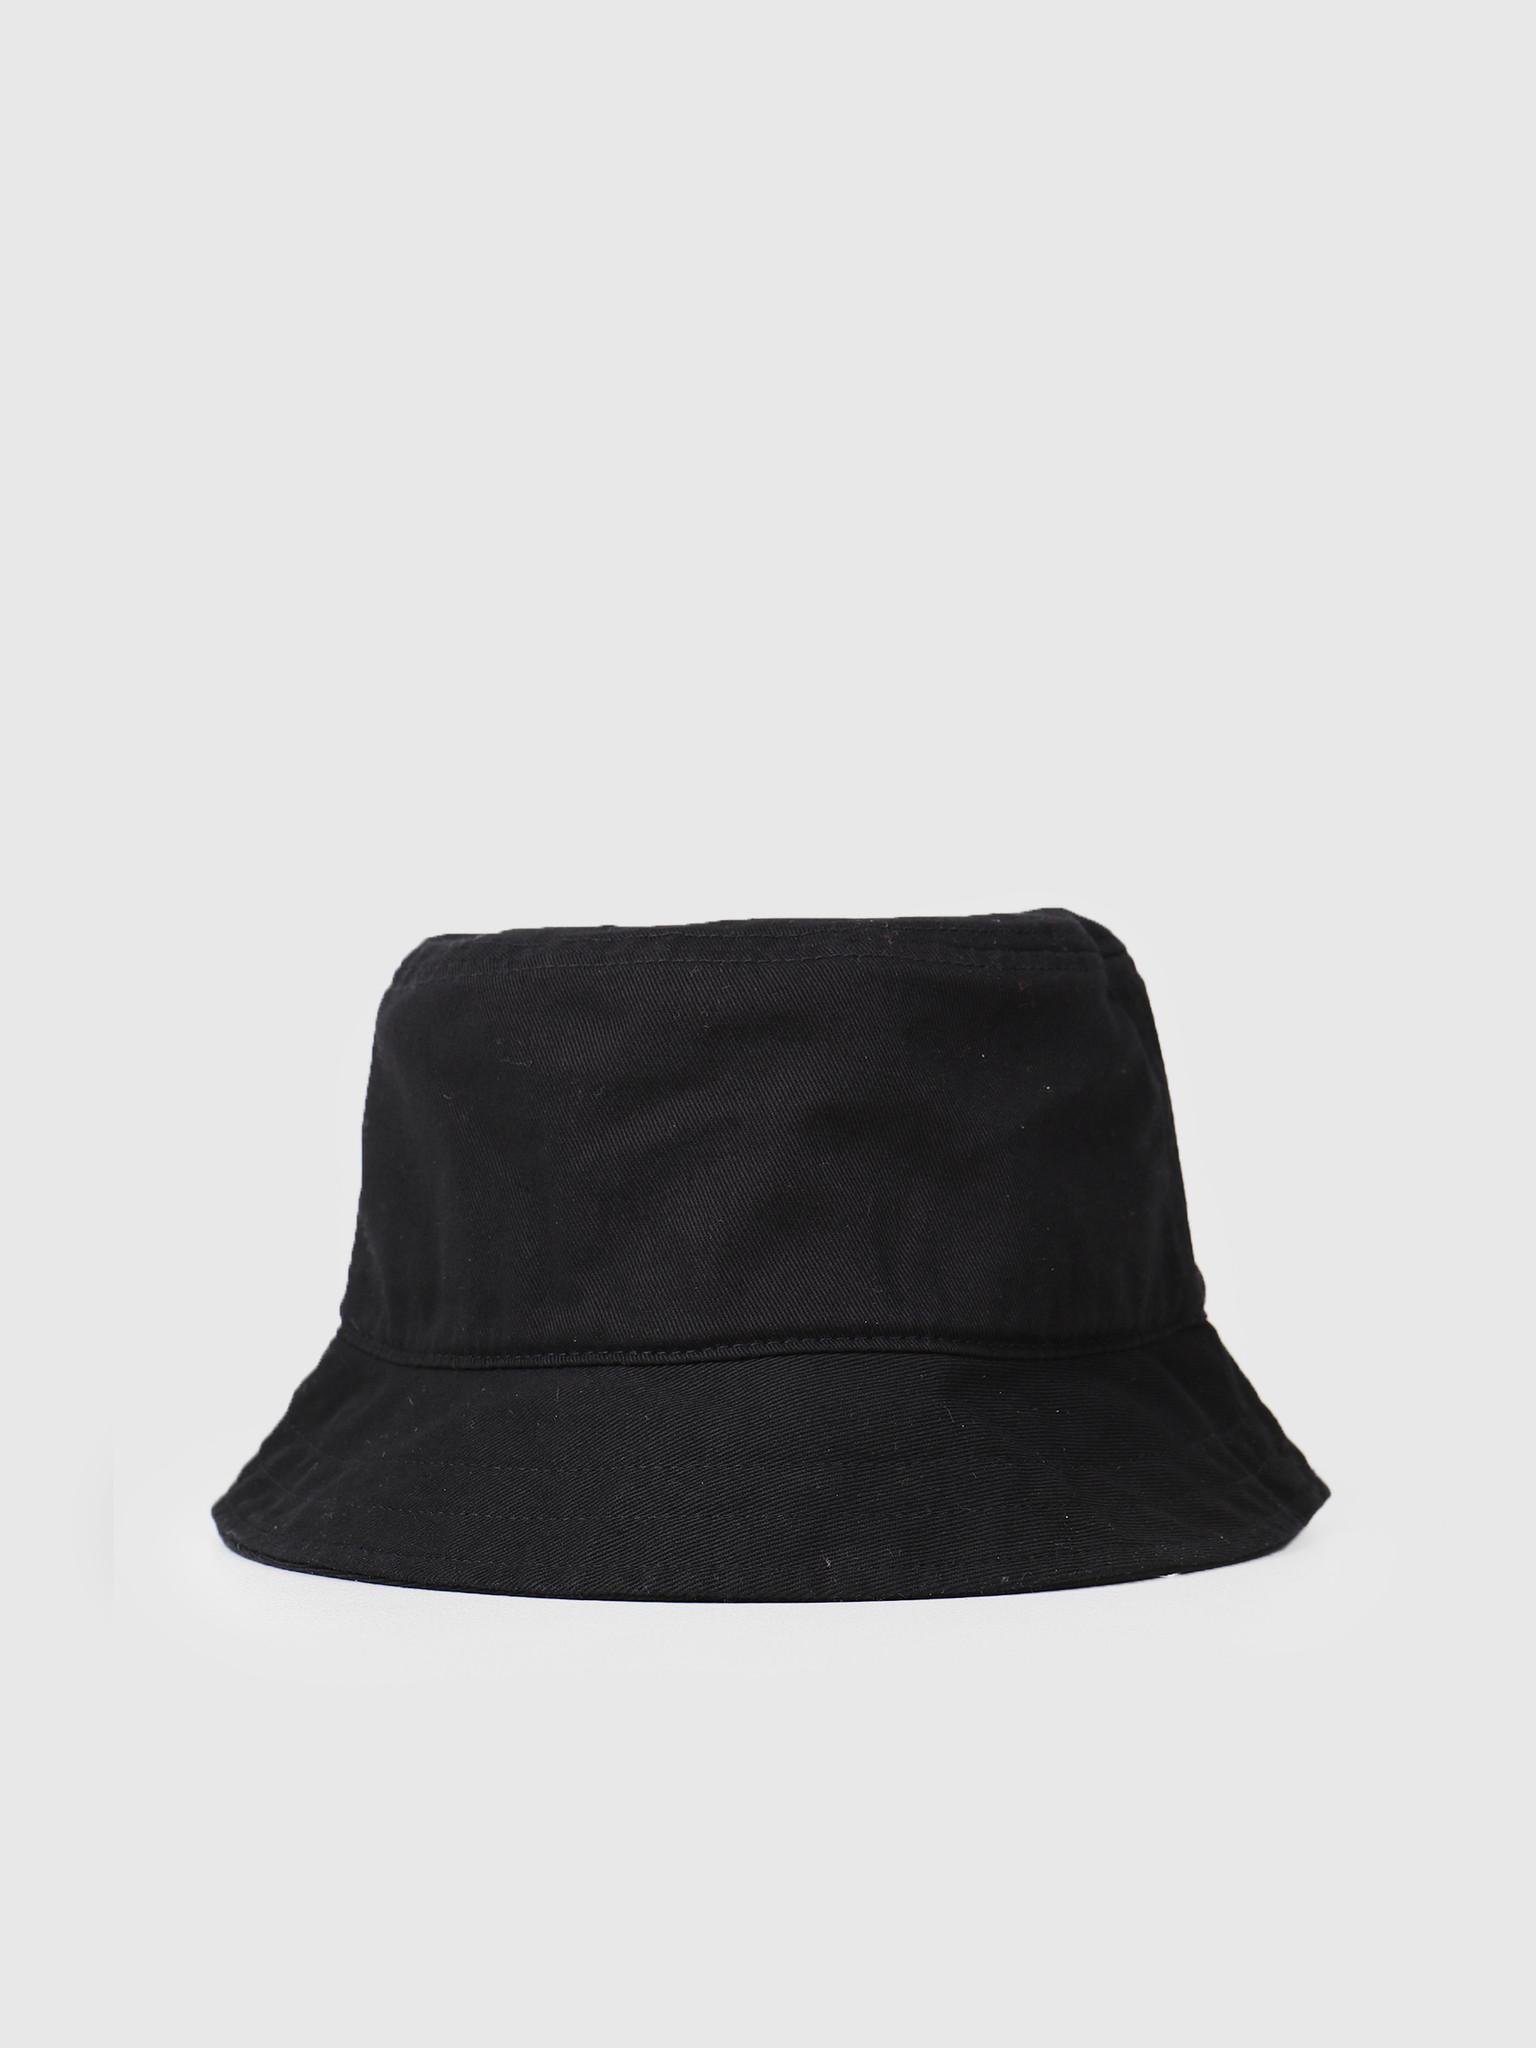 Lyle and Scott Lyle and Scott Cotton Twill Bucket Hat 572 True Black HE800A